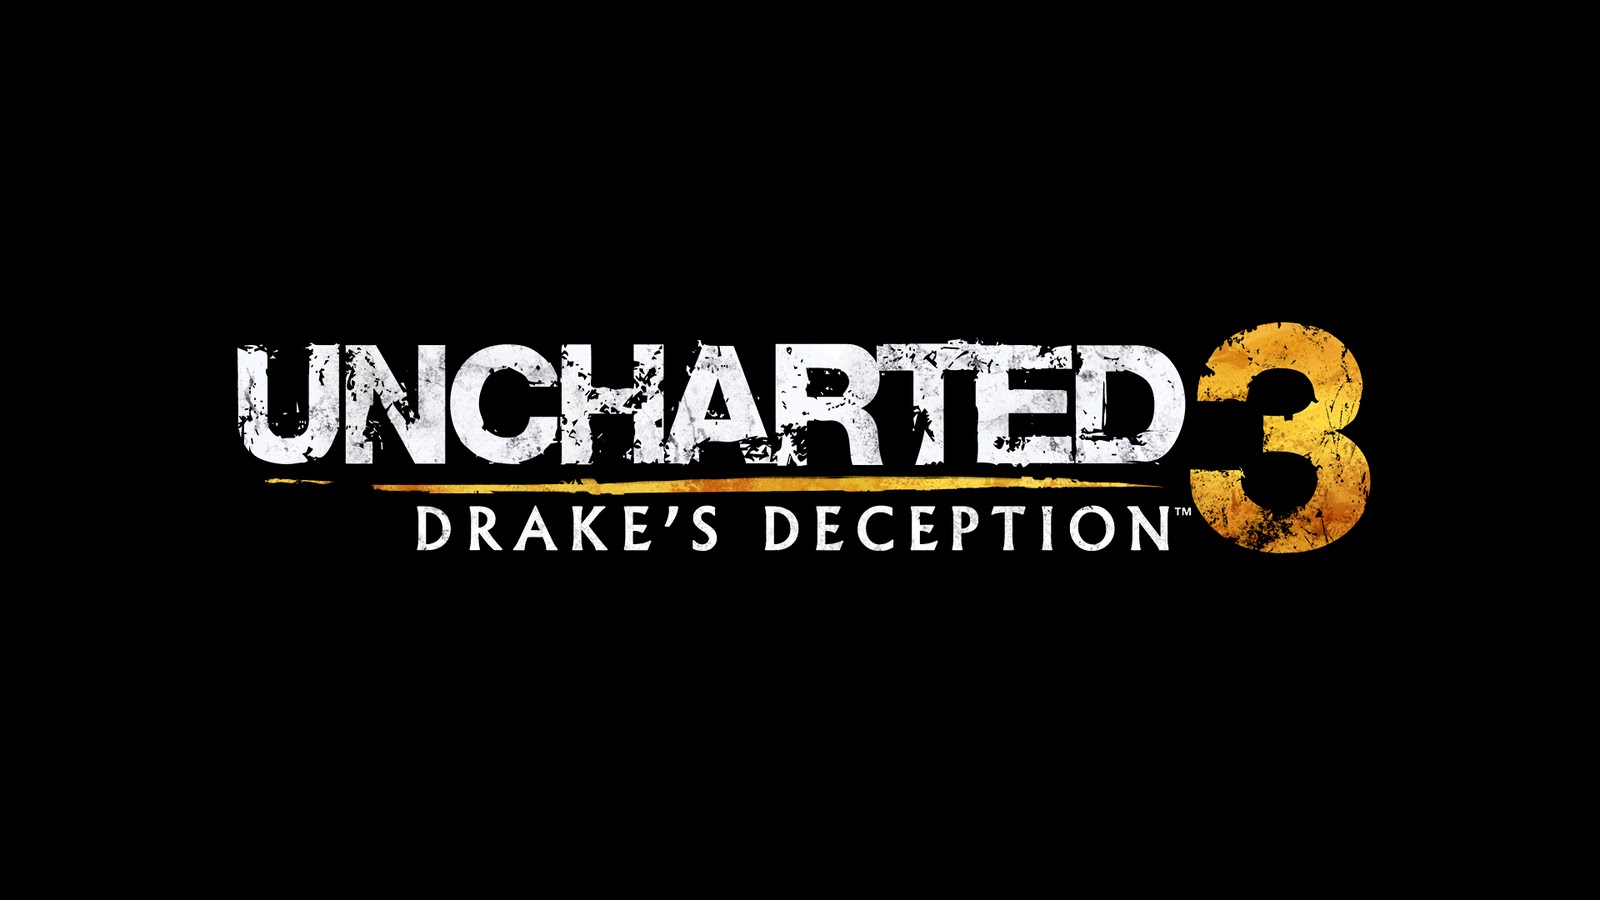 Must see Wallpaper Logo Drake - Uncharted%203_%20Drake%27s_%20Deception_HD_Wallpaper_Logo_www  You Should Have_632793.jpg